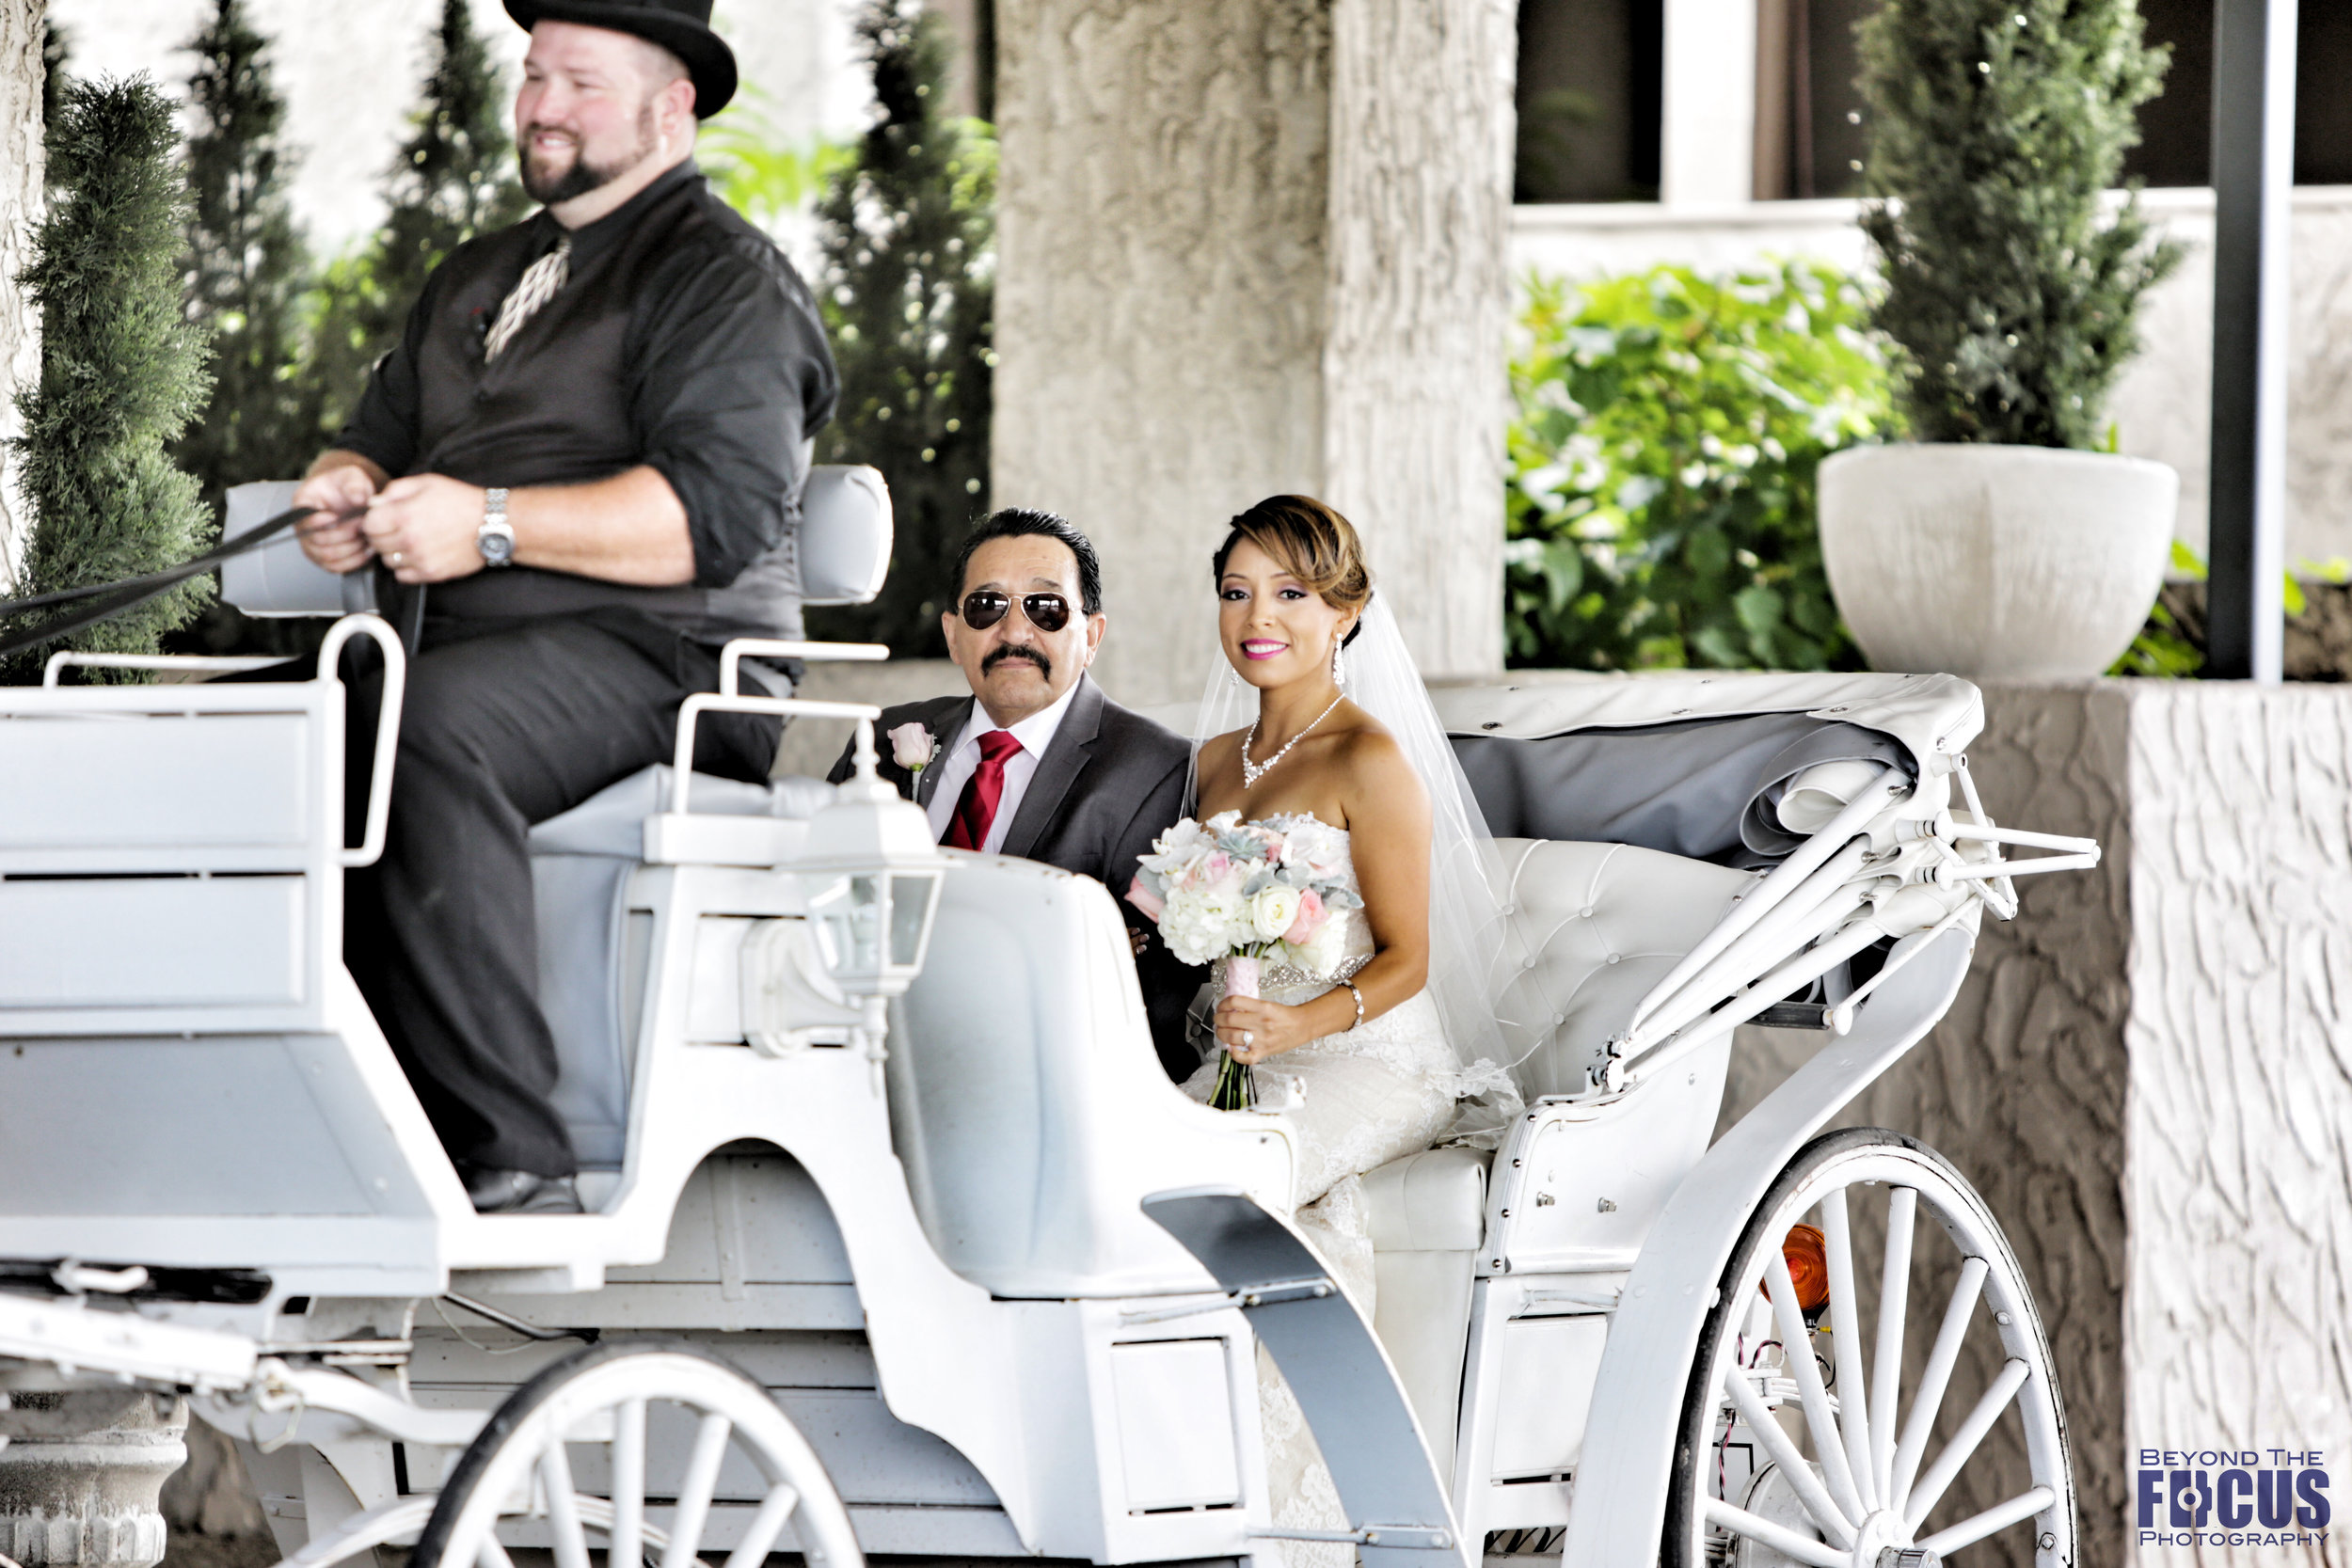 Palmer Wedding - Wedding Ceremony9.jpg